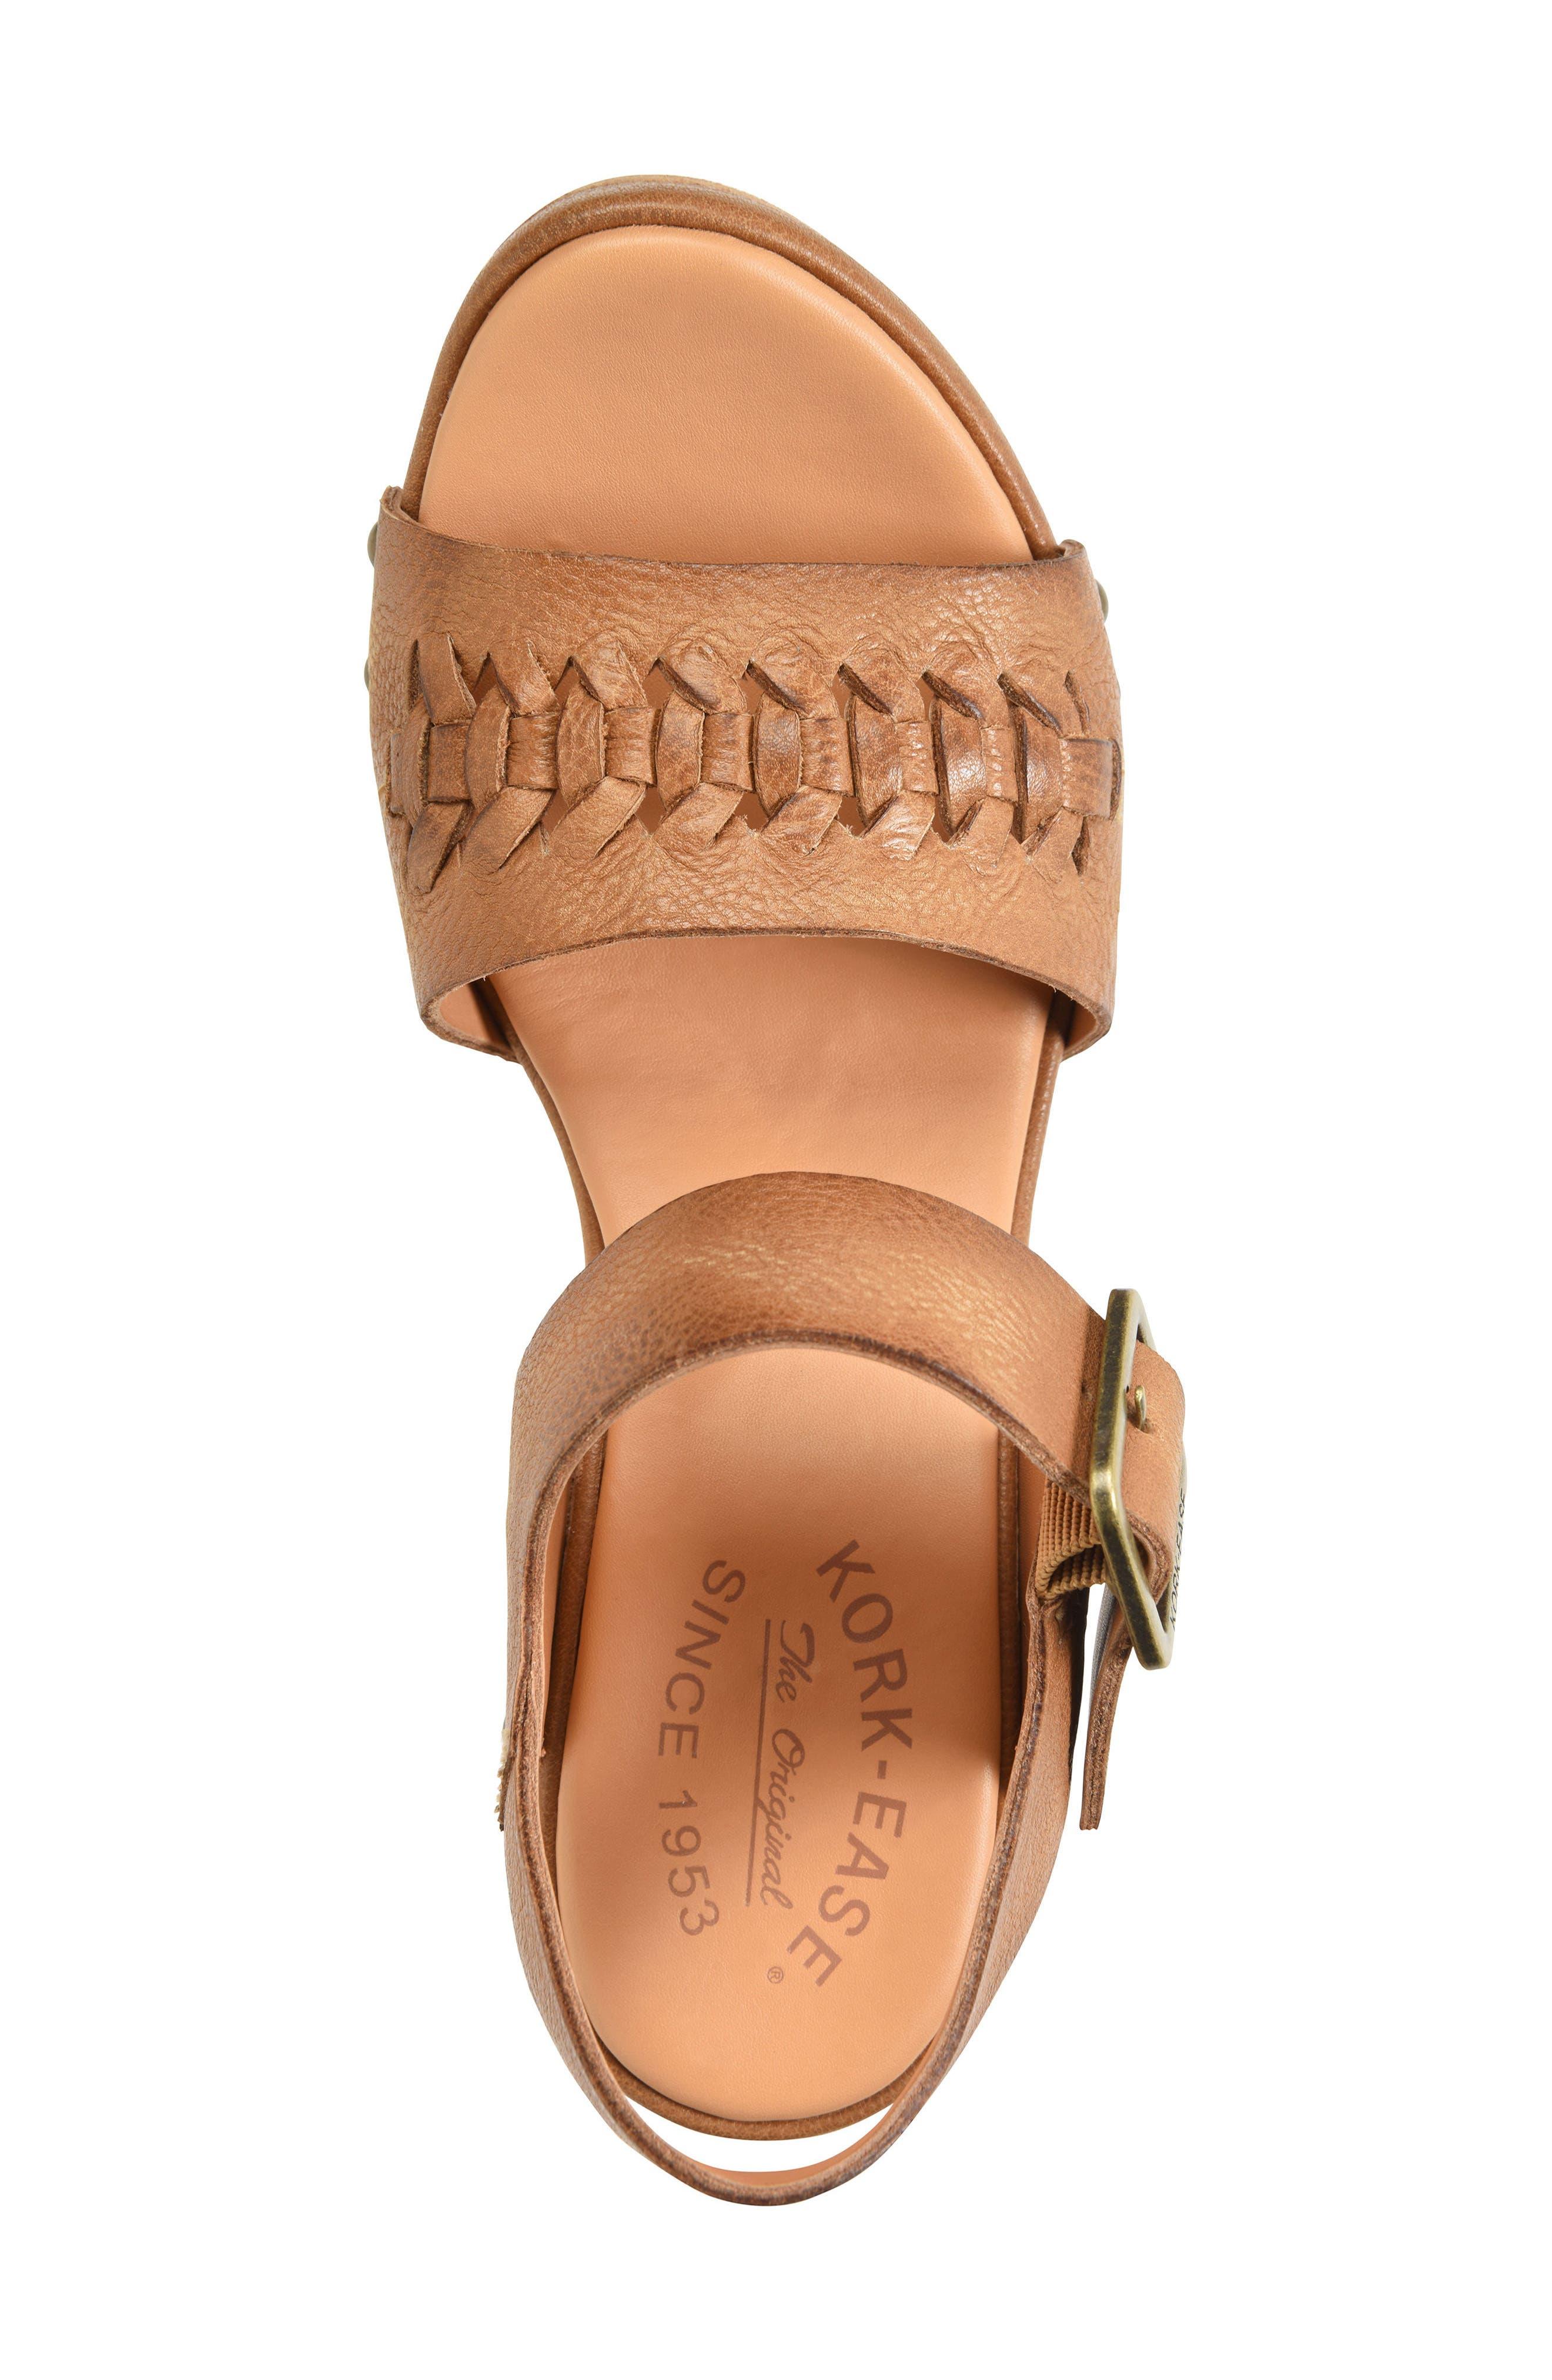 Pasilla Platform Sandal,                             Alternate thumbnail 5, color,                             Light Brown Leather